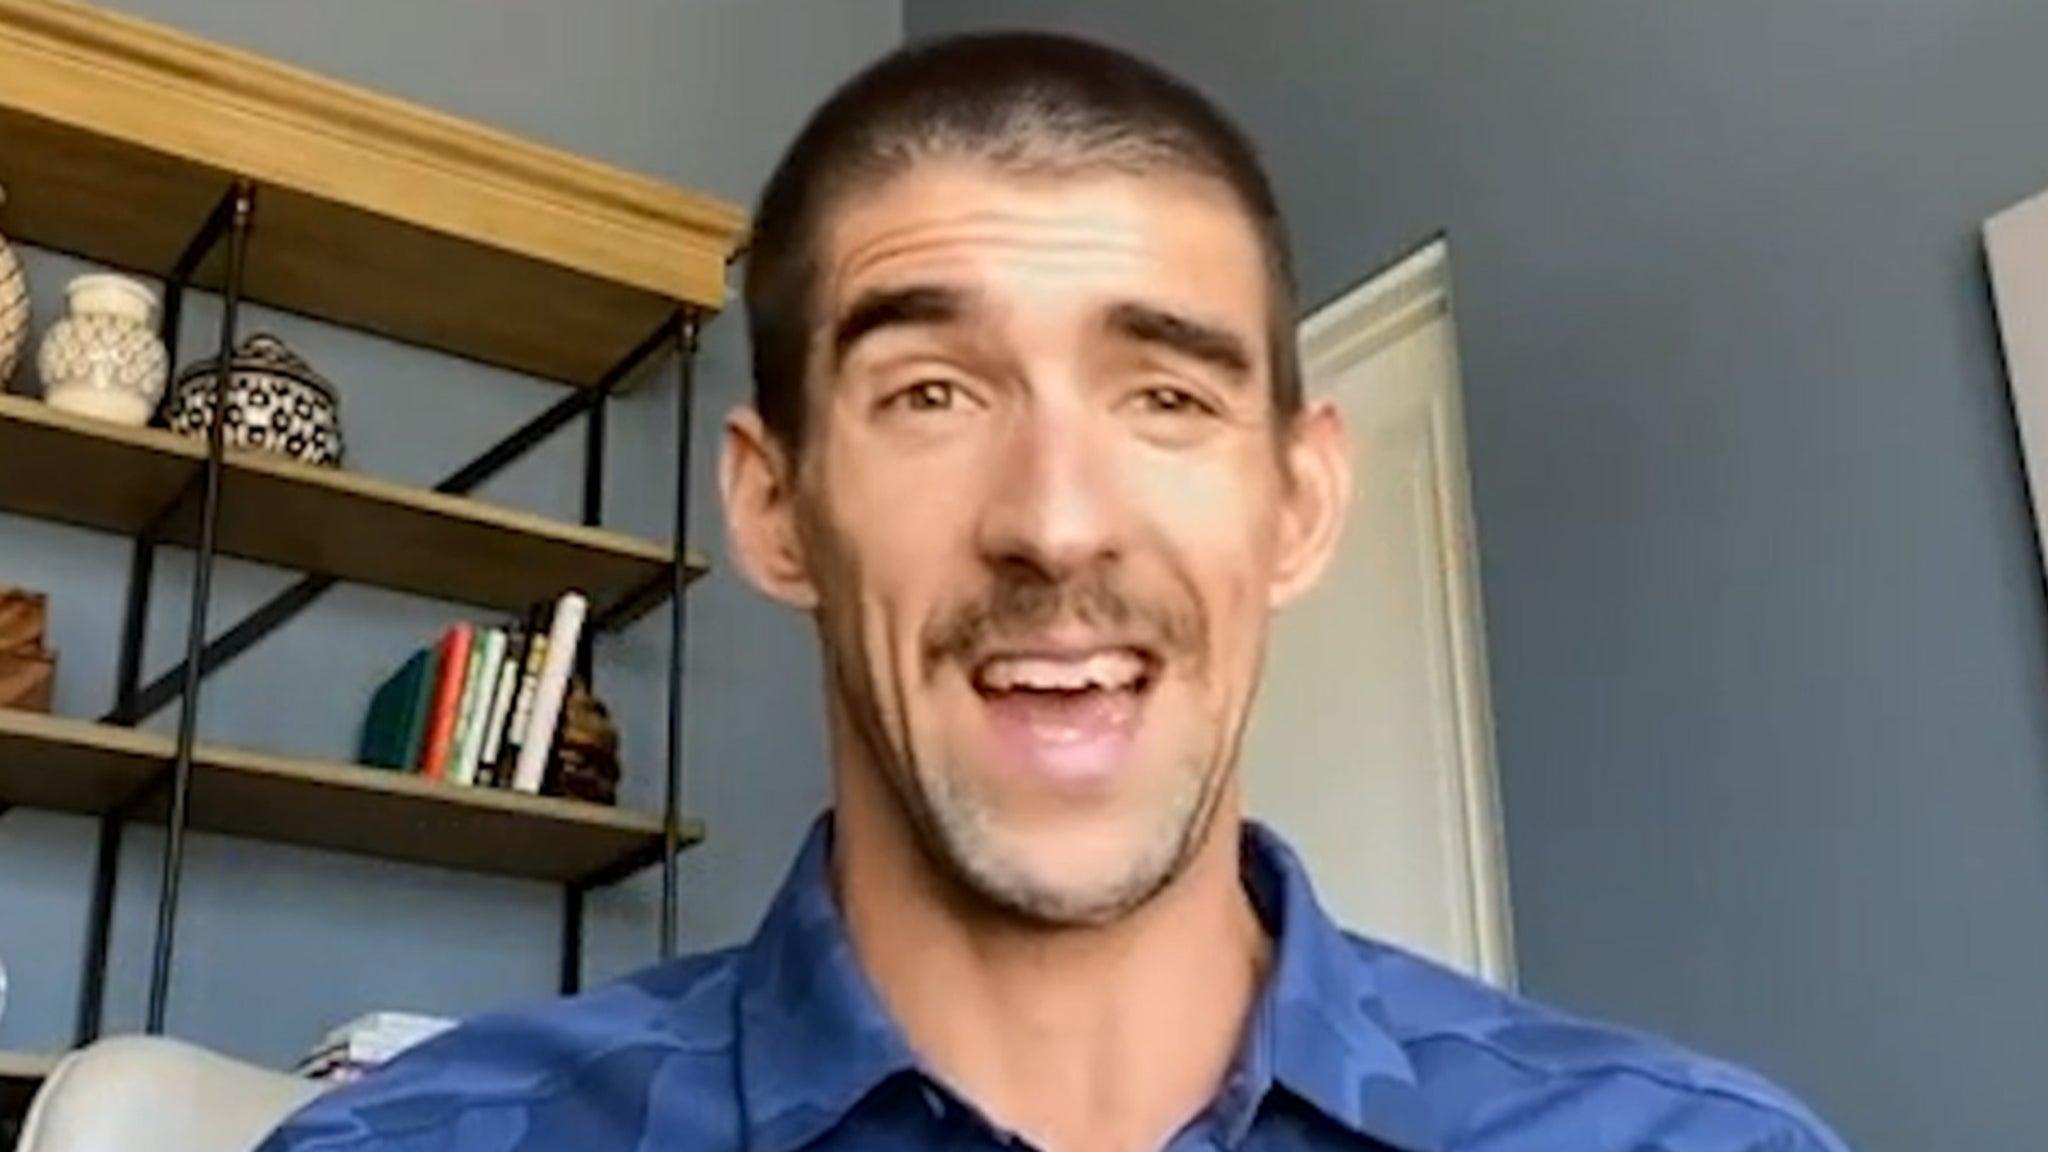 Michael Phelps Says He Was An 'A-Hole' Like Michael Jordan, Pushed Teammates